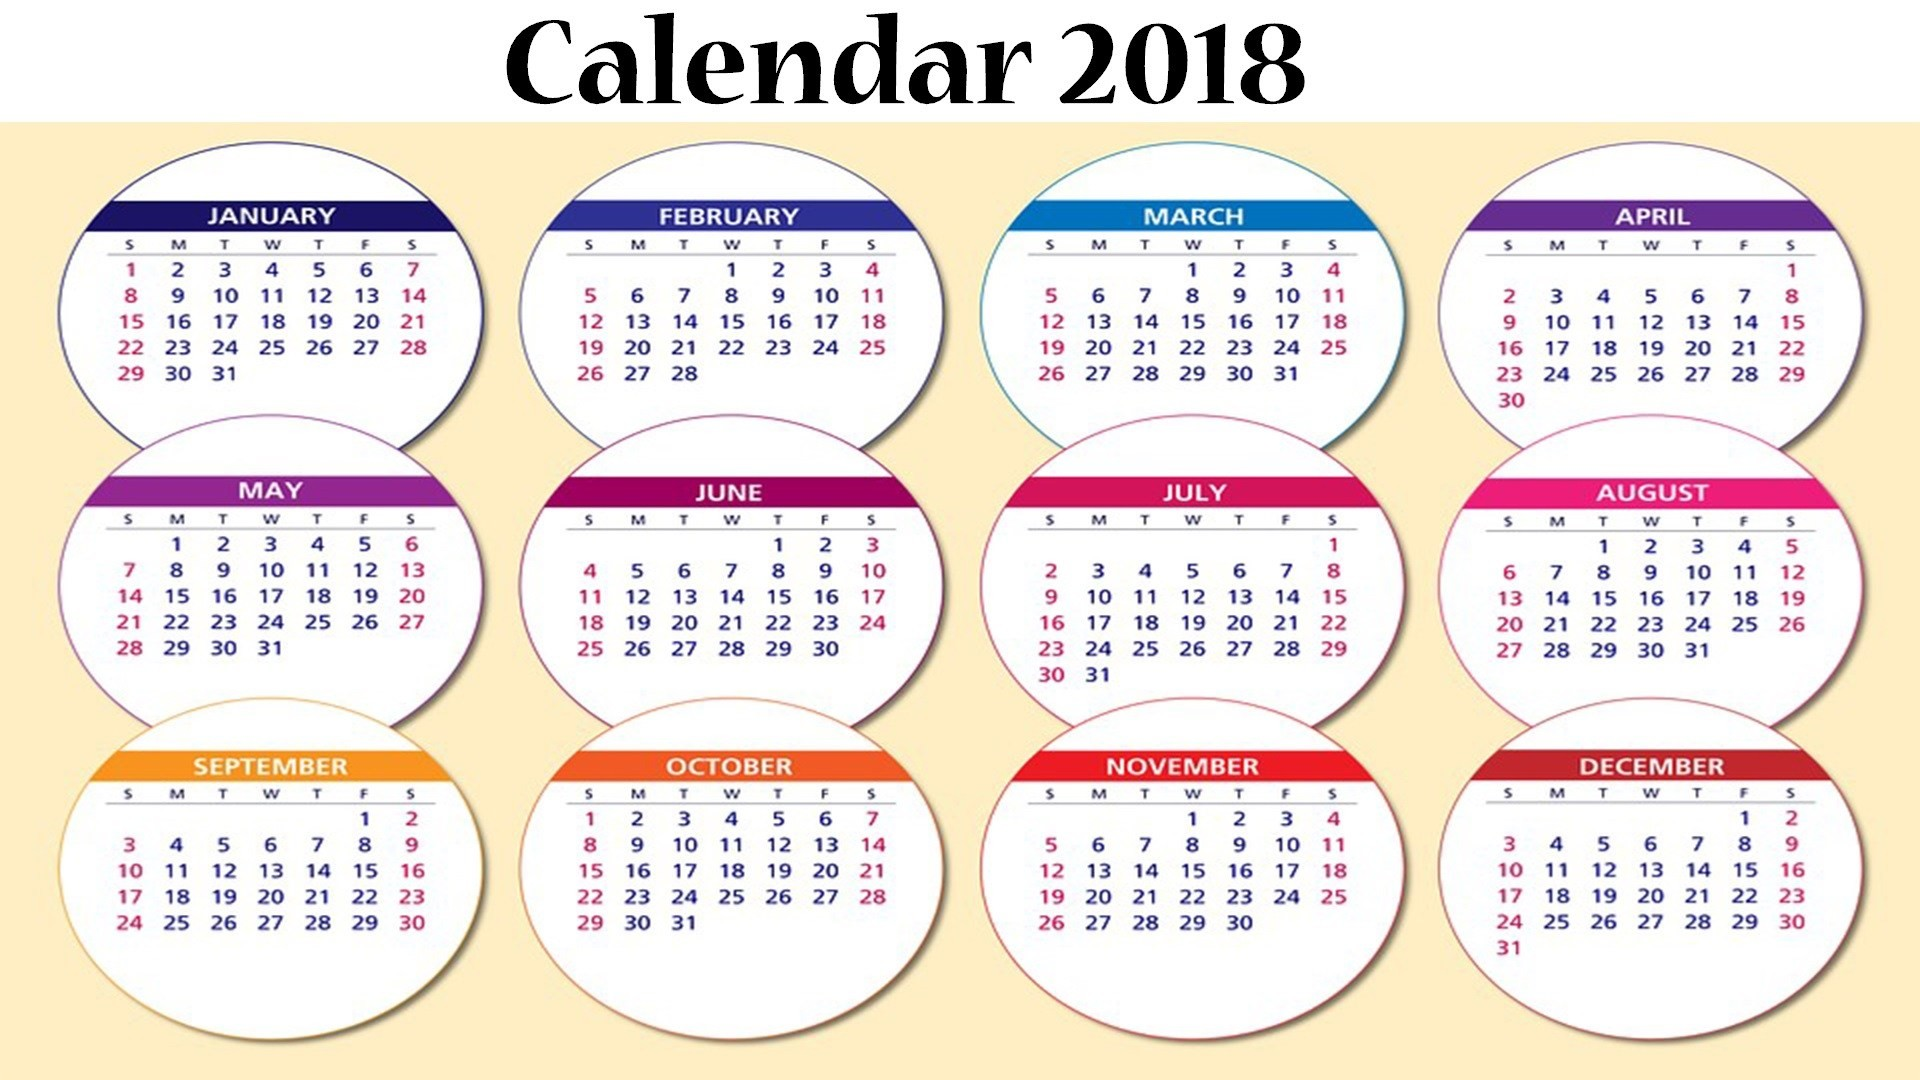 calendar 2018 download